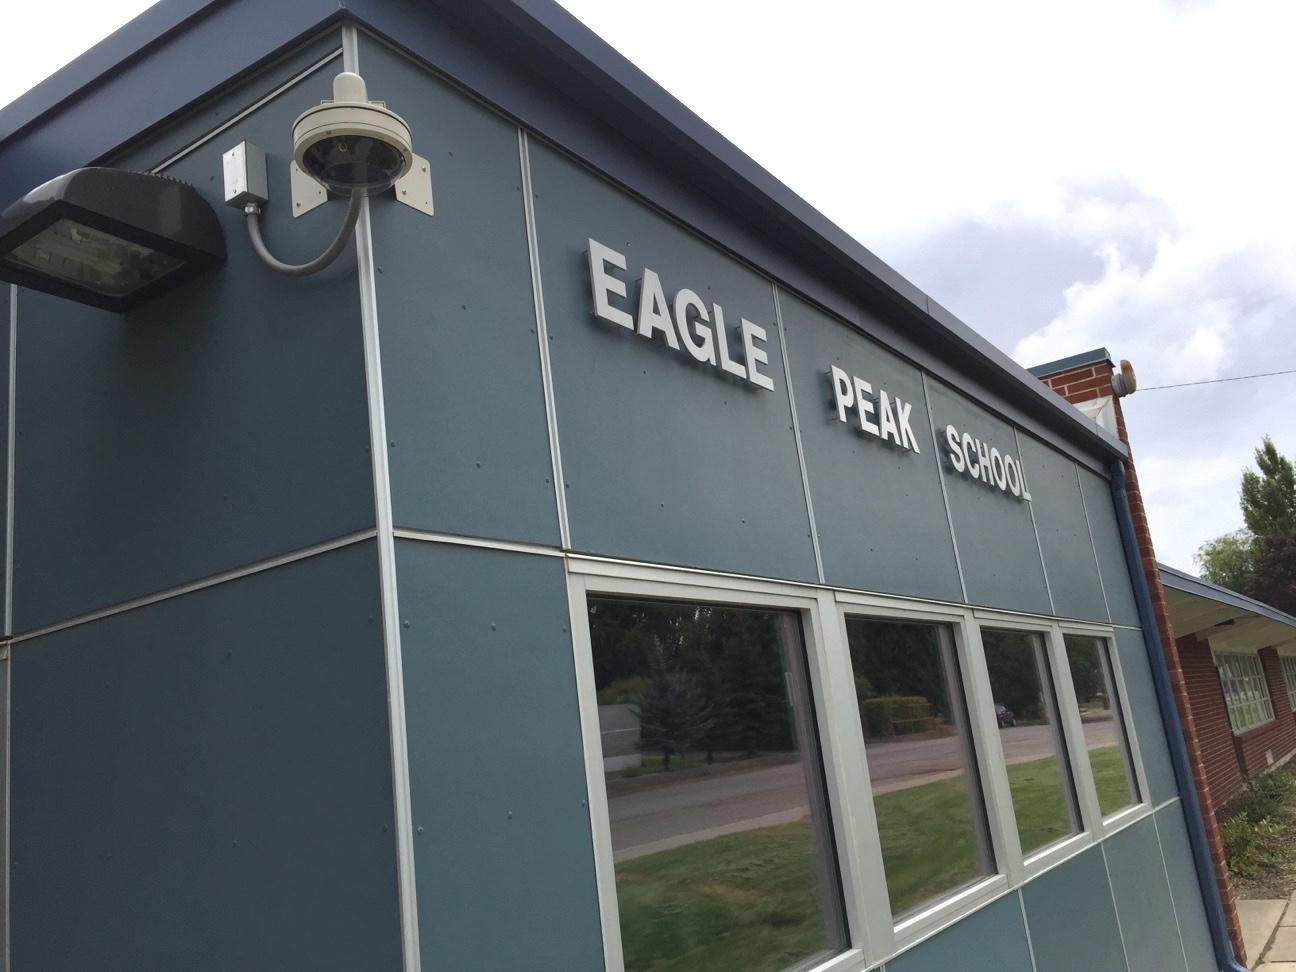 Eagle Peak School, Spokane, WA